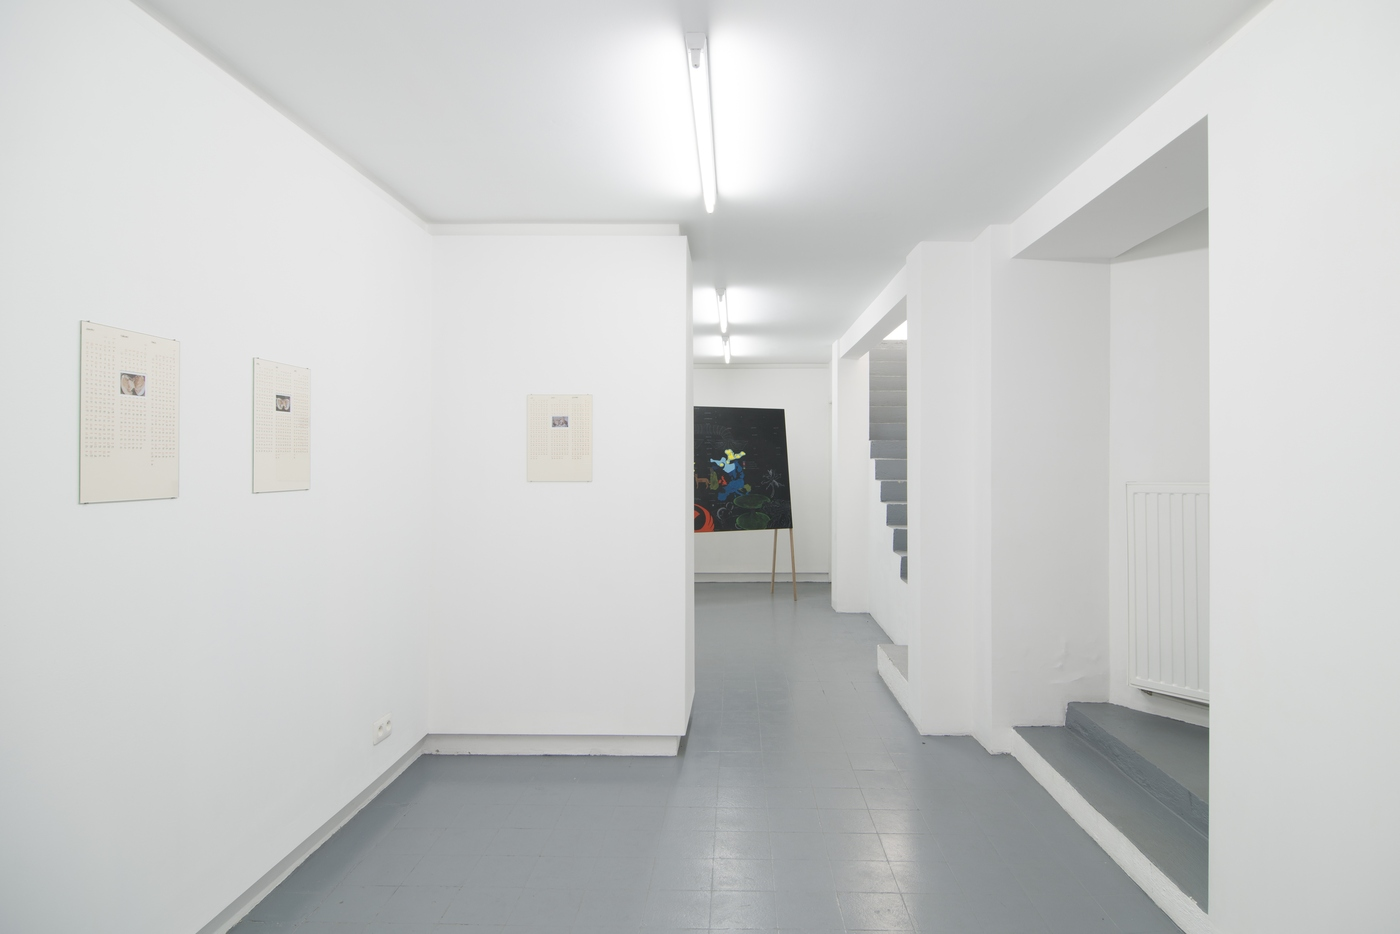 Raffaella Crispino_Tokyo-San Francisco_installation view 3